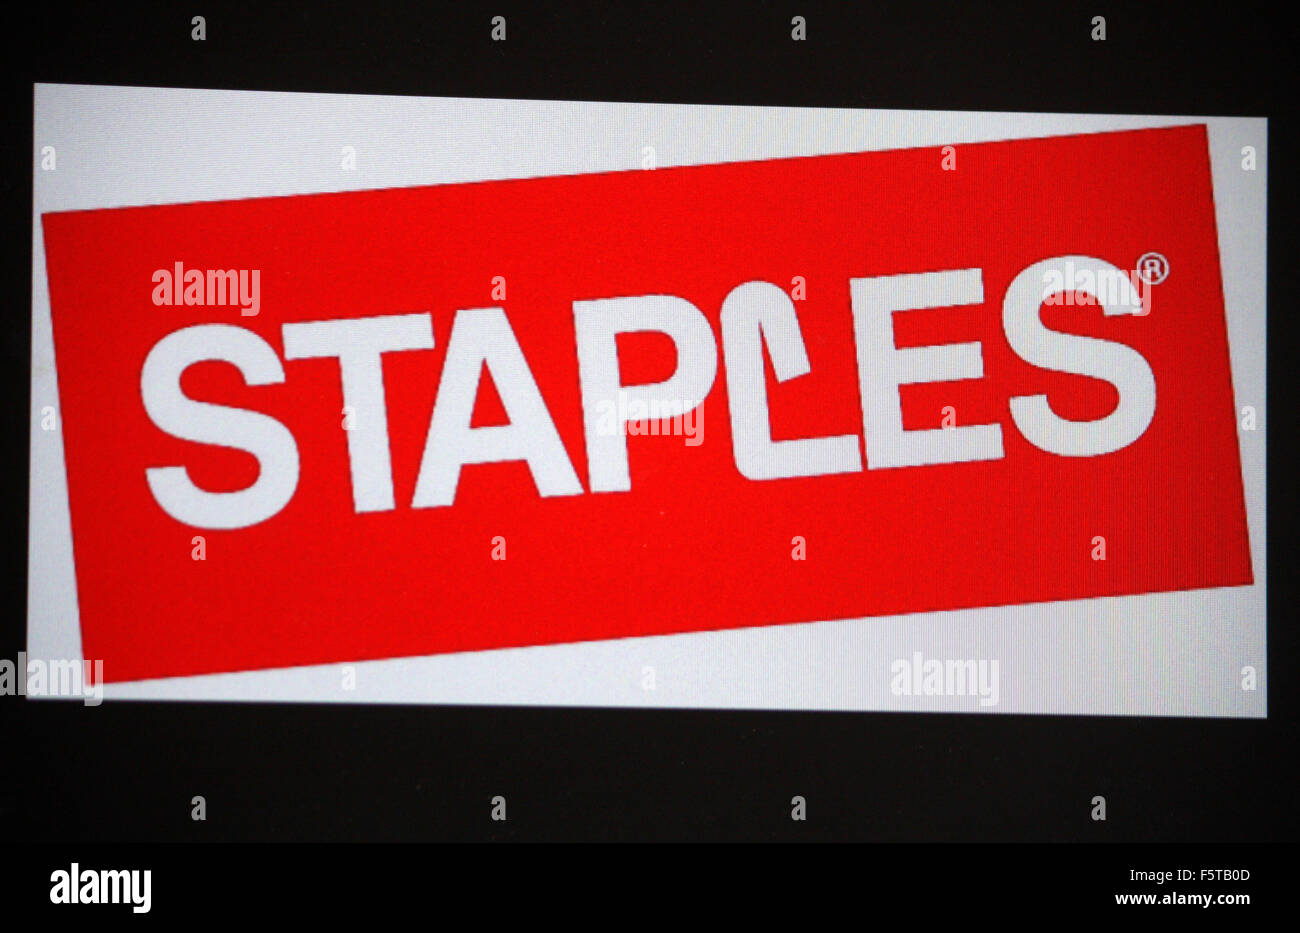 Markenname: 'Staples', Berlin. - Stock Image